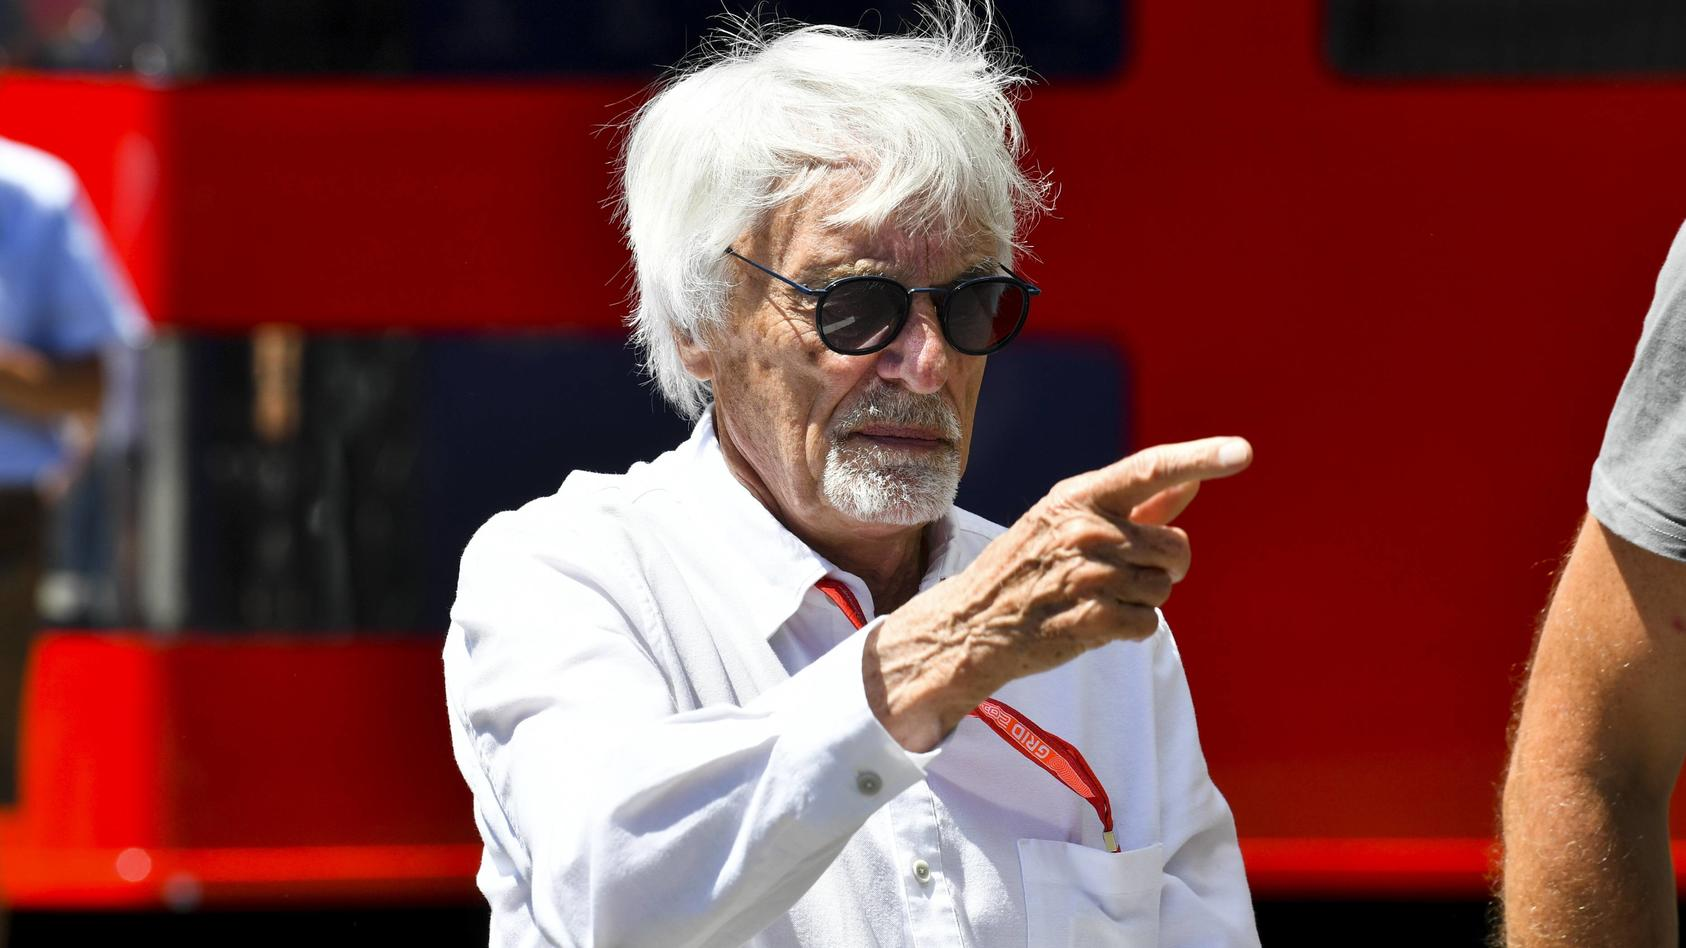 2019 Austrian GP RED BULL RING AUSTRIA JUNE 30 Bernie Ecclestone Chairman Emiritus of Formula